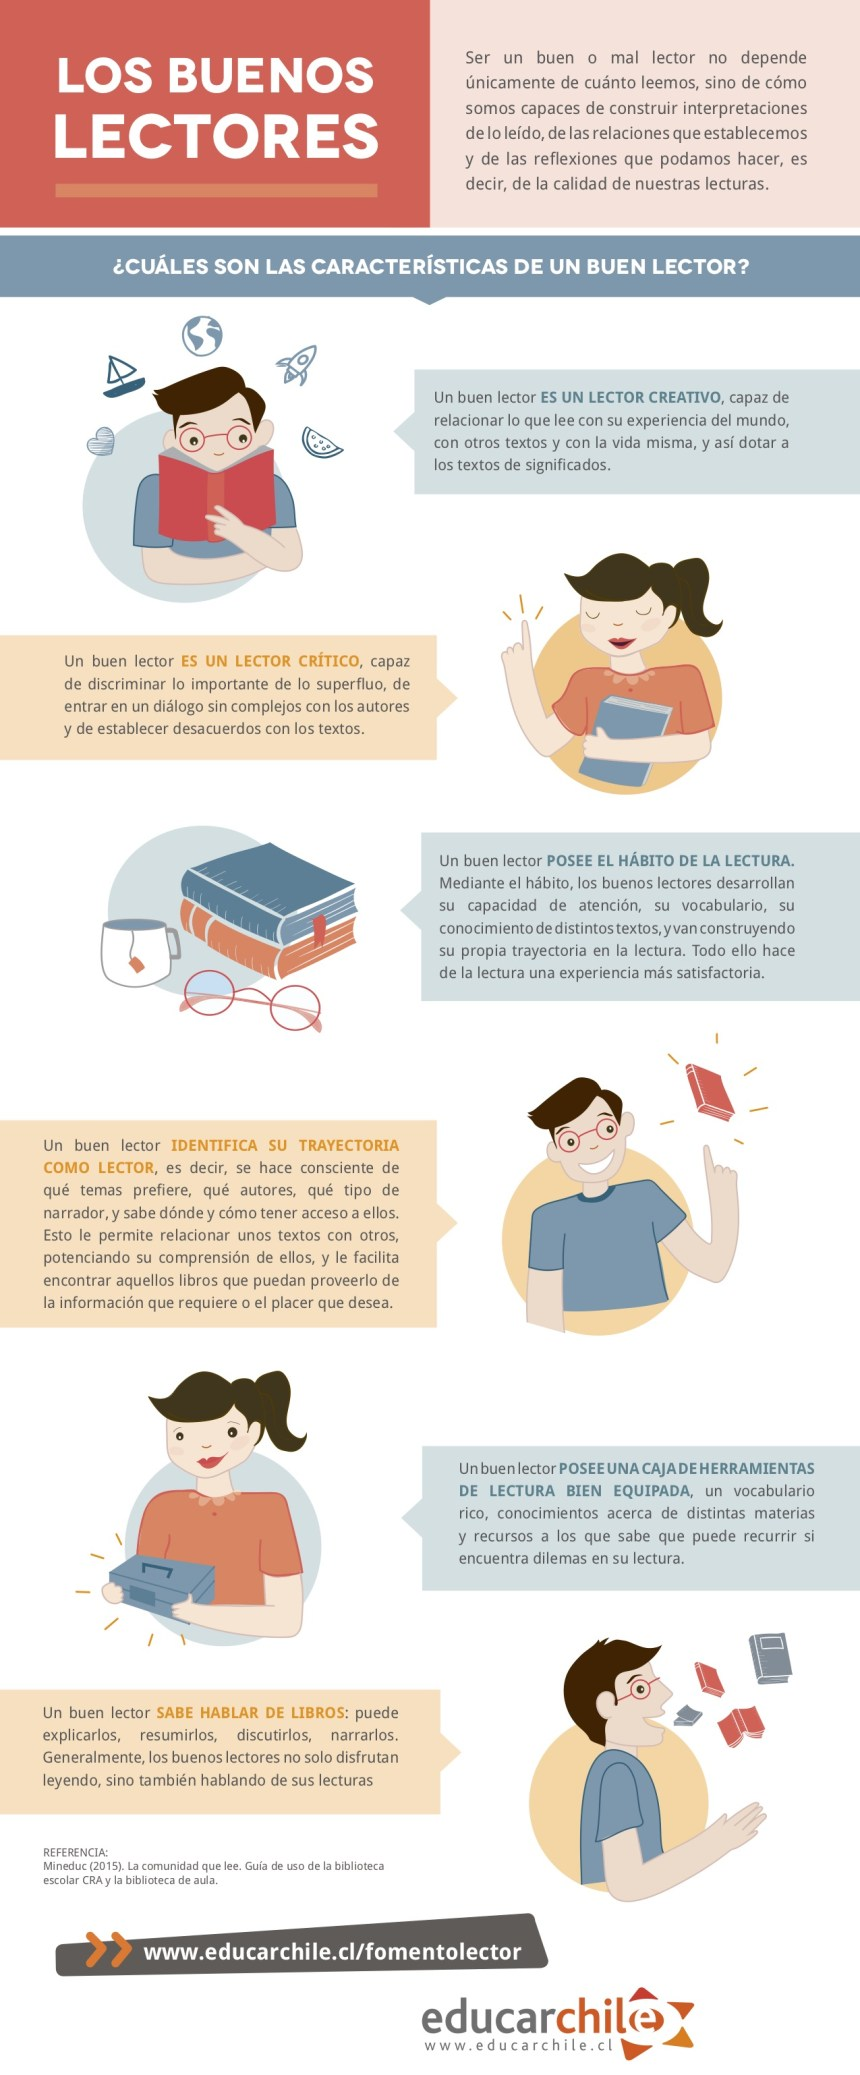 Características de los buenos lectores #infografia #infographic #education